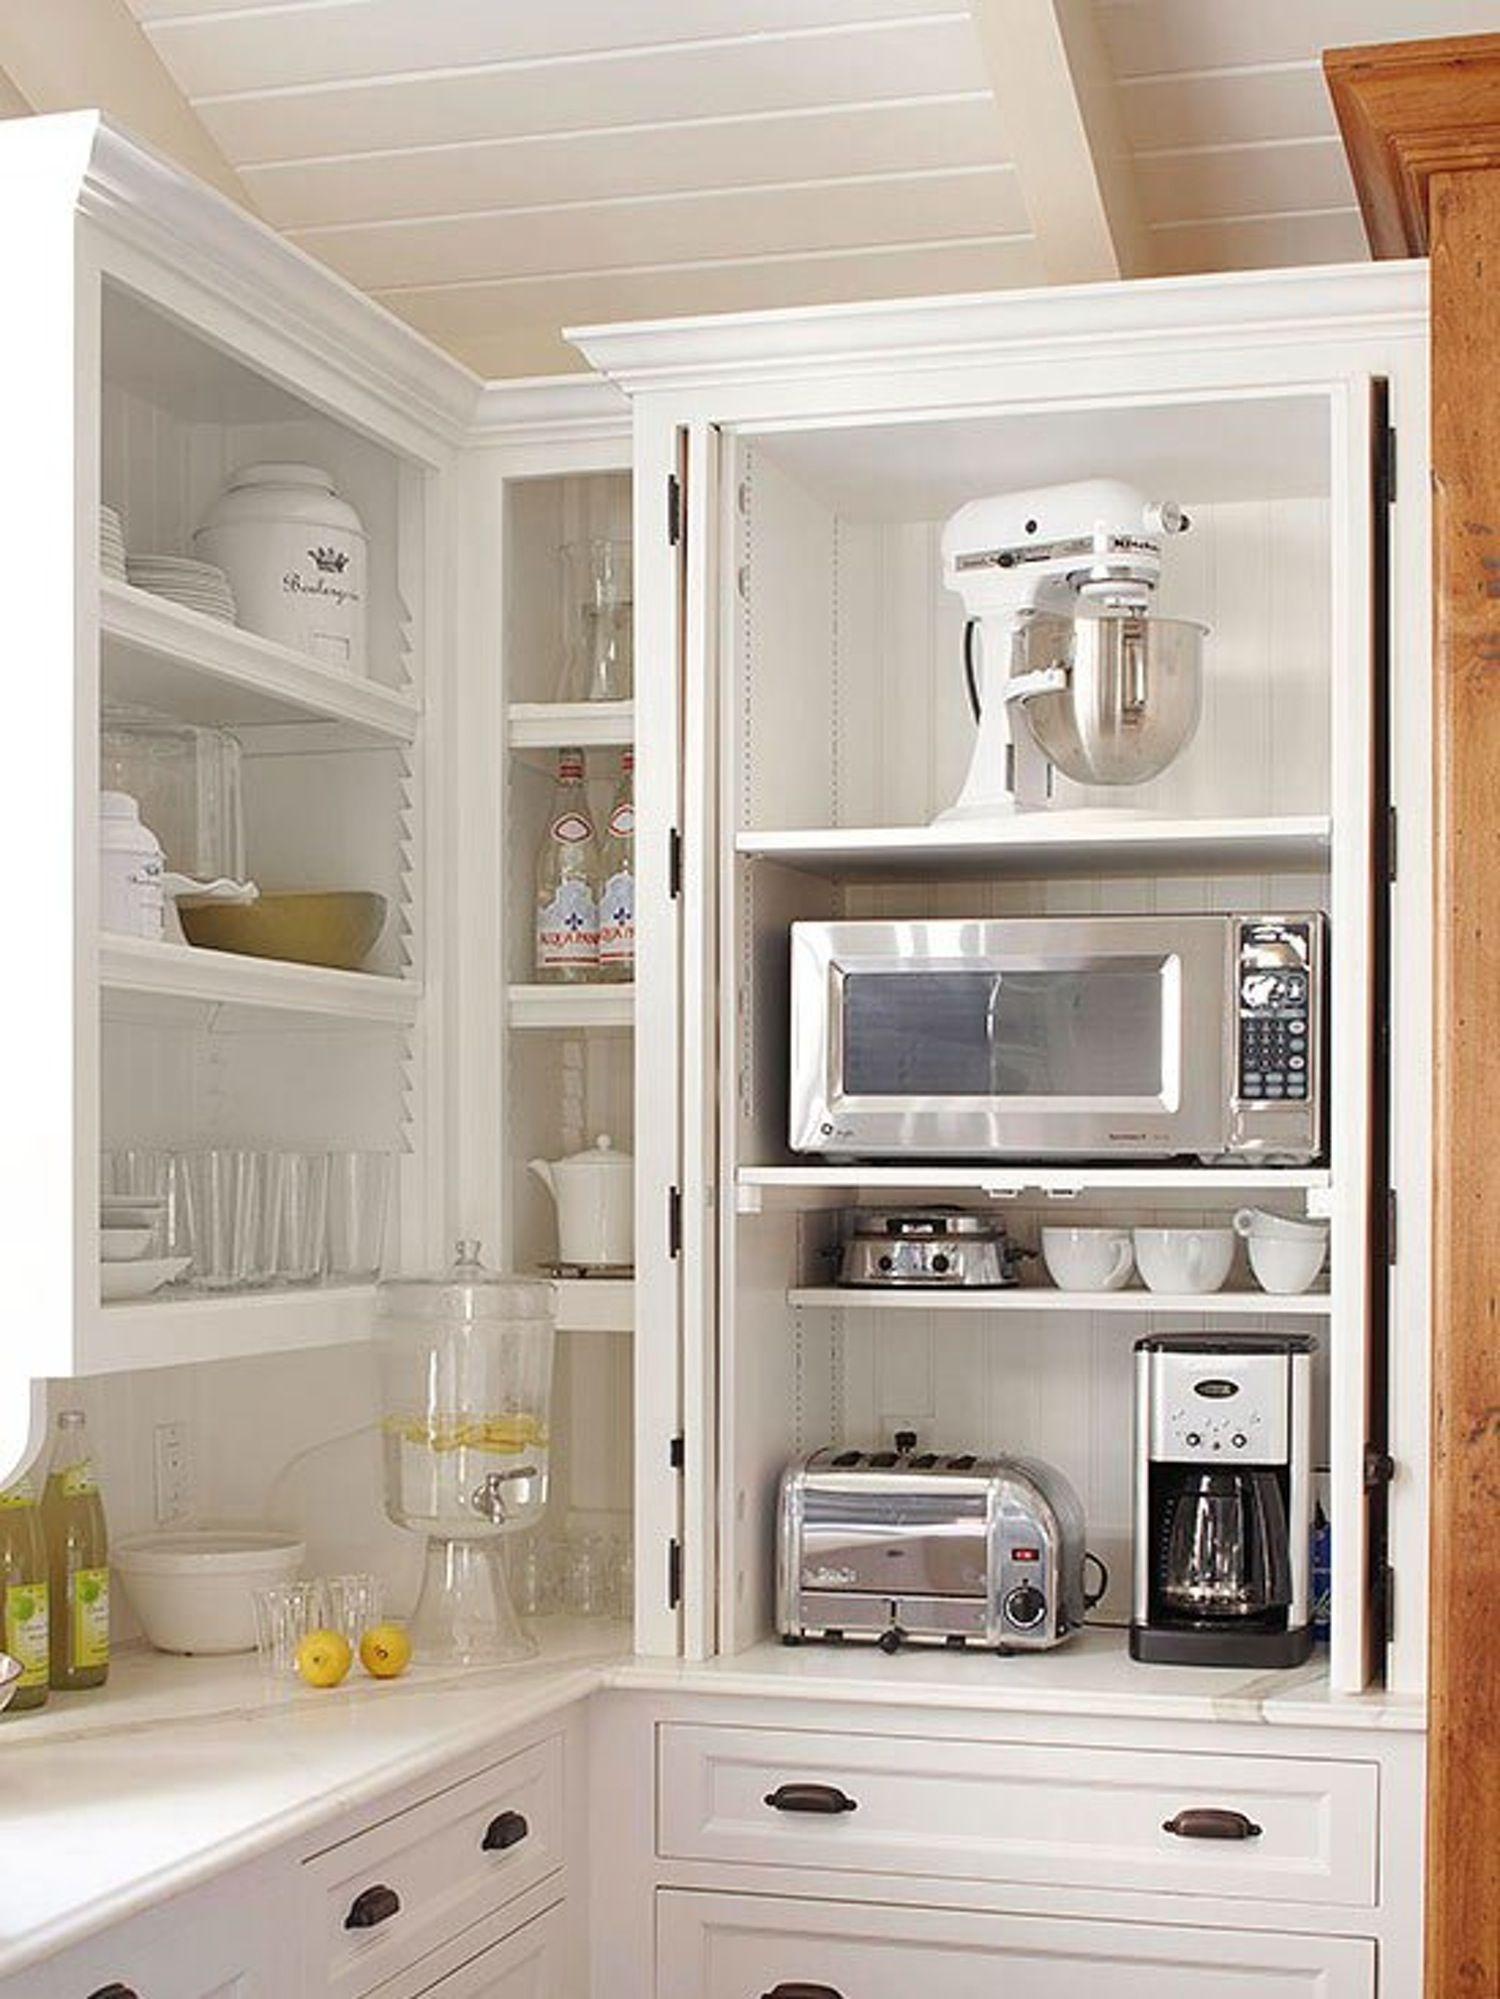 10 Snazzy Ways To Organize And Store Small Appliances Clever Kitchen Storage Kitchen Design Kitchen Storage Solutions